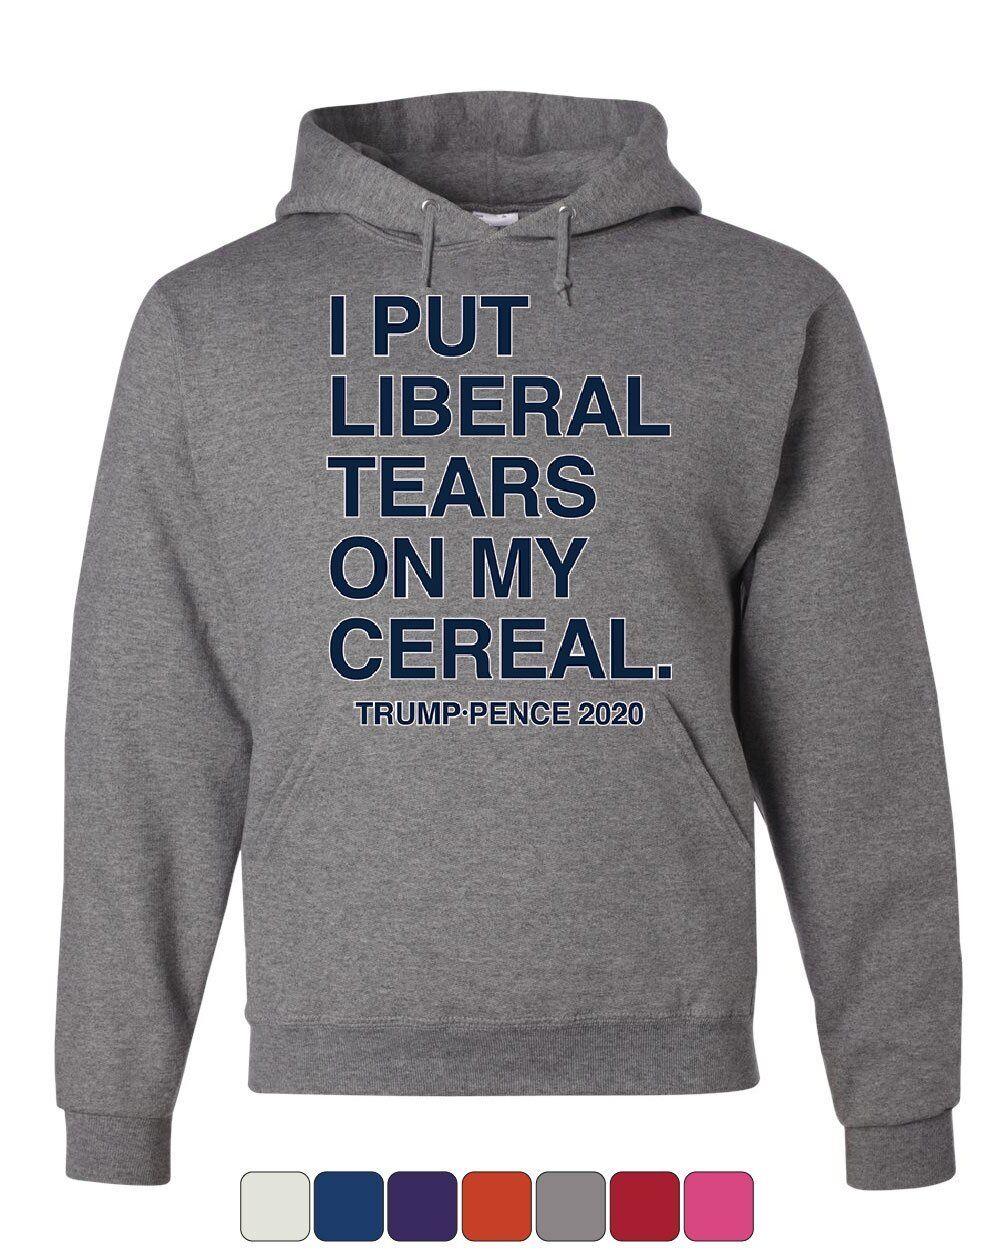 I Put Liberal Tears on My Cereal Hoodie Trump Pence 2020 MAGA Sweatshirt